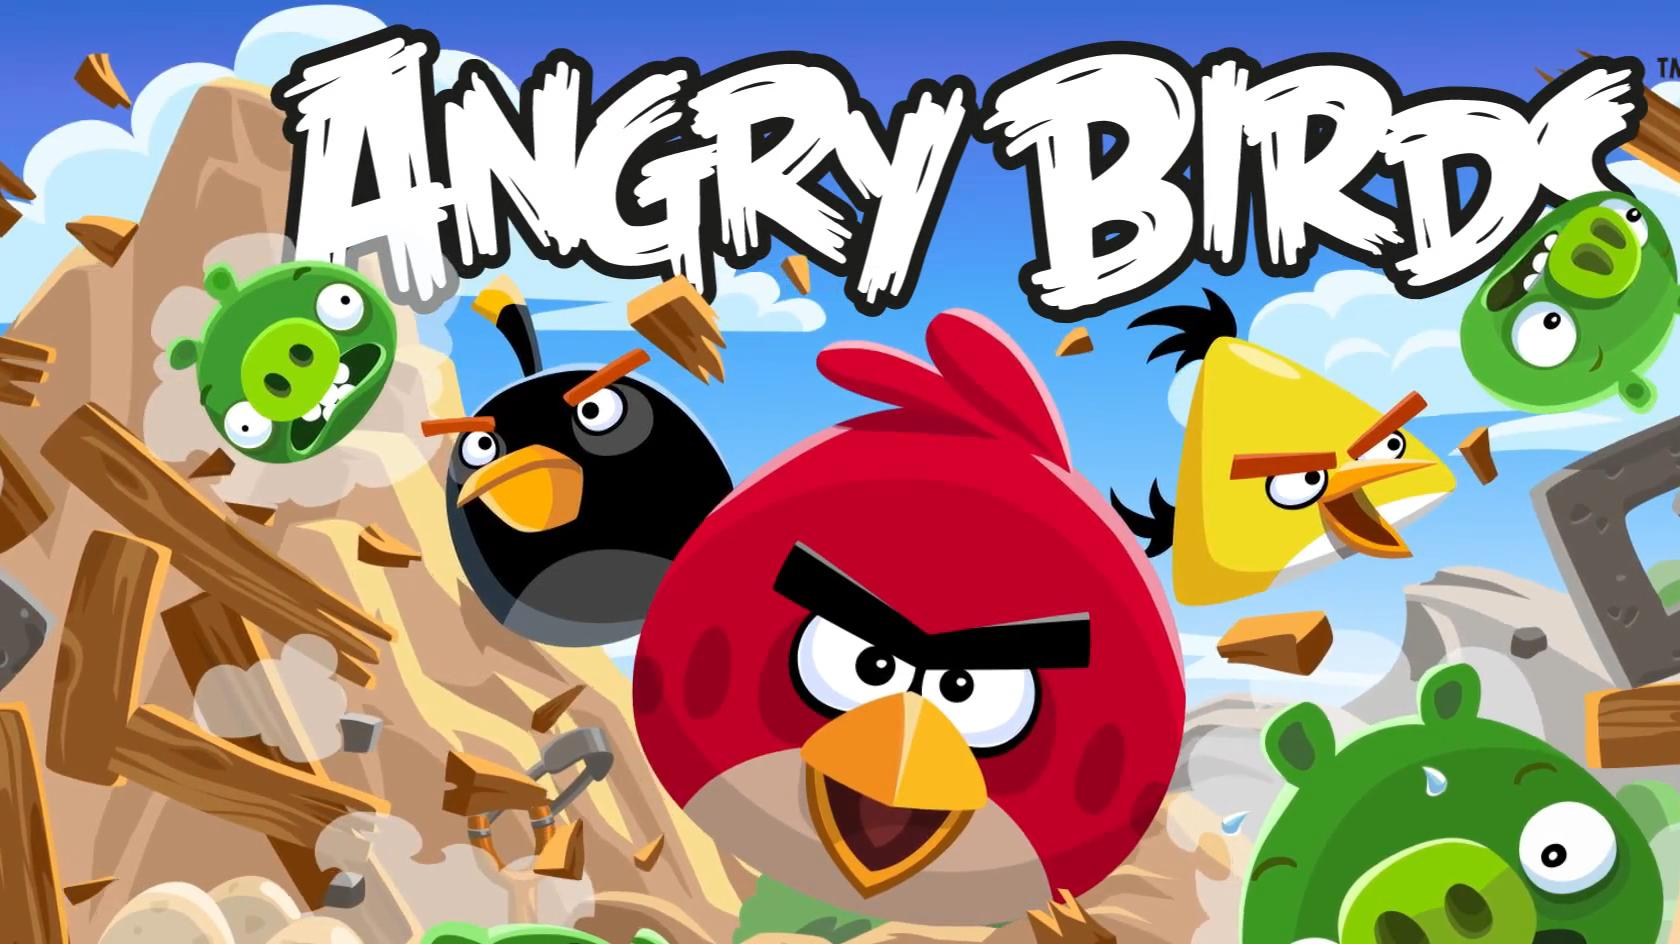 Bambini torturano passerotti per emulare Angry Birds